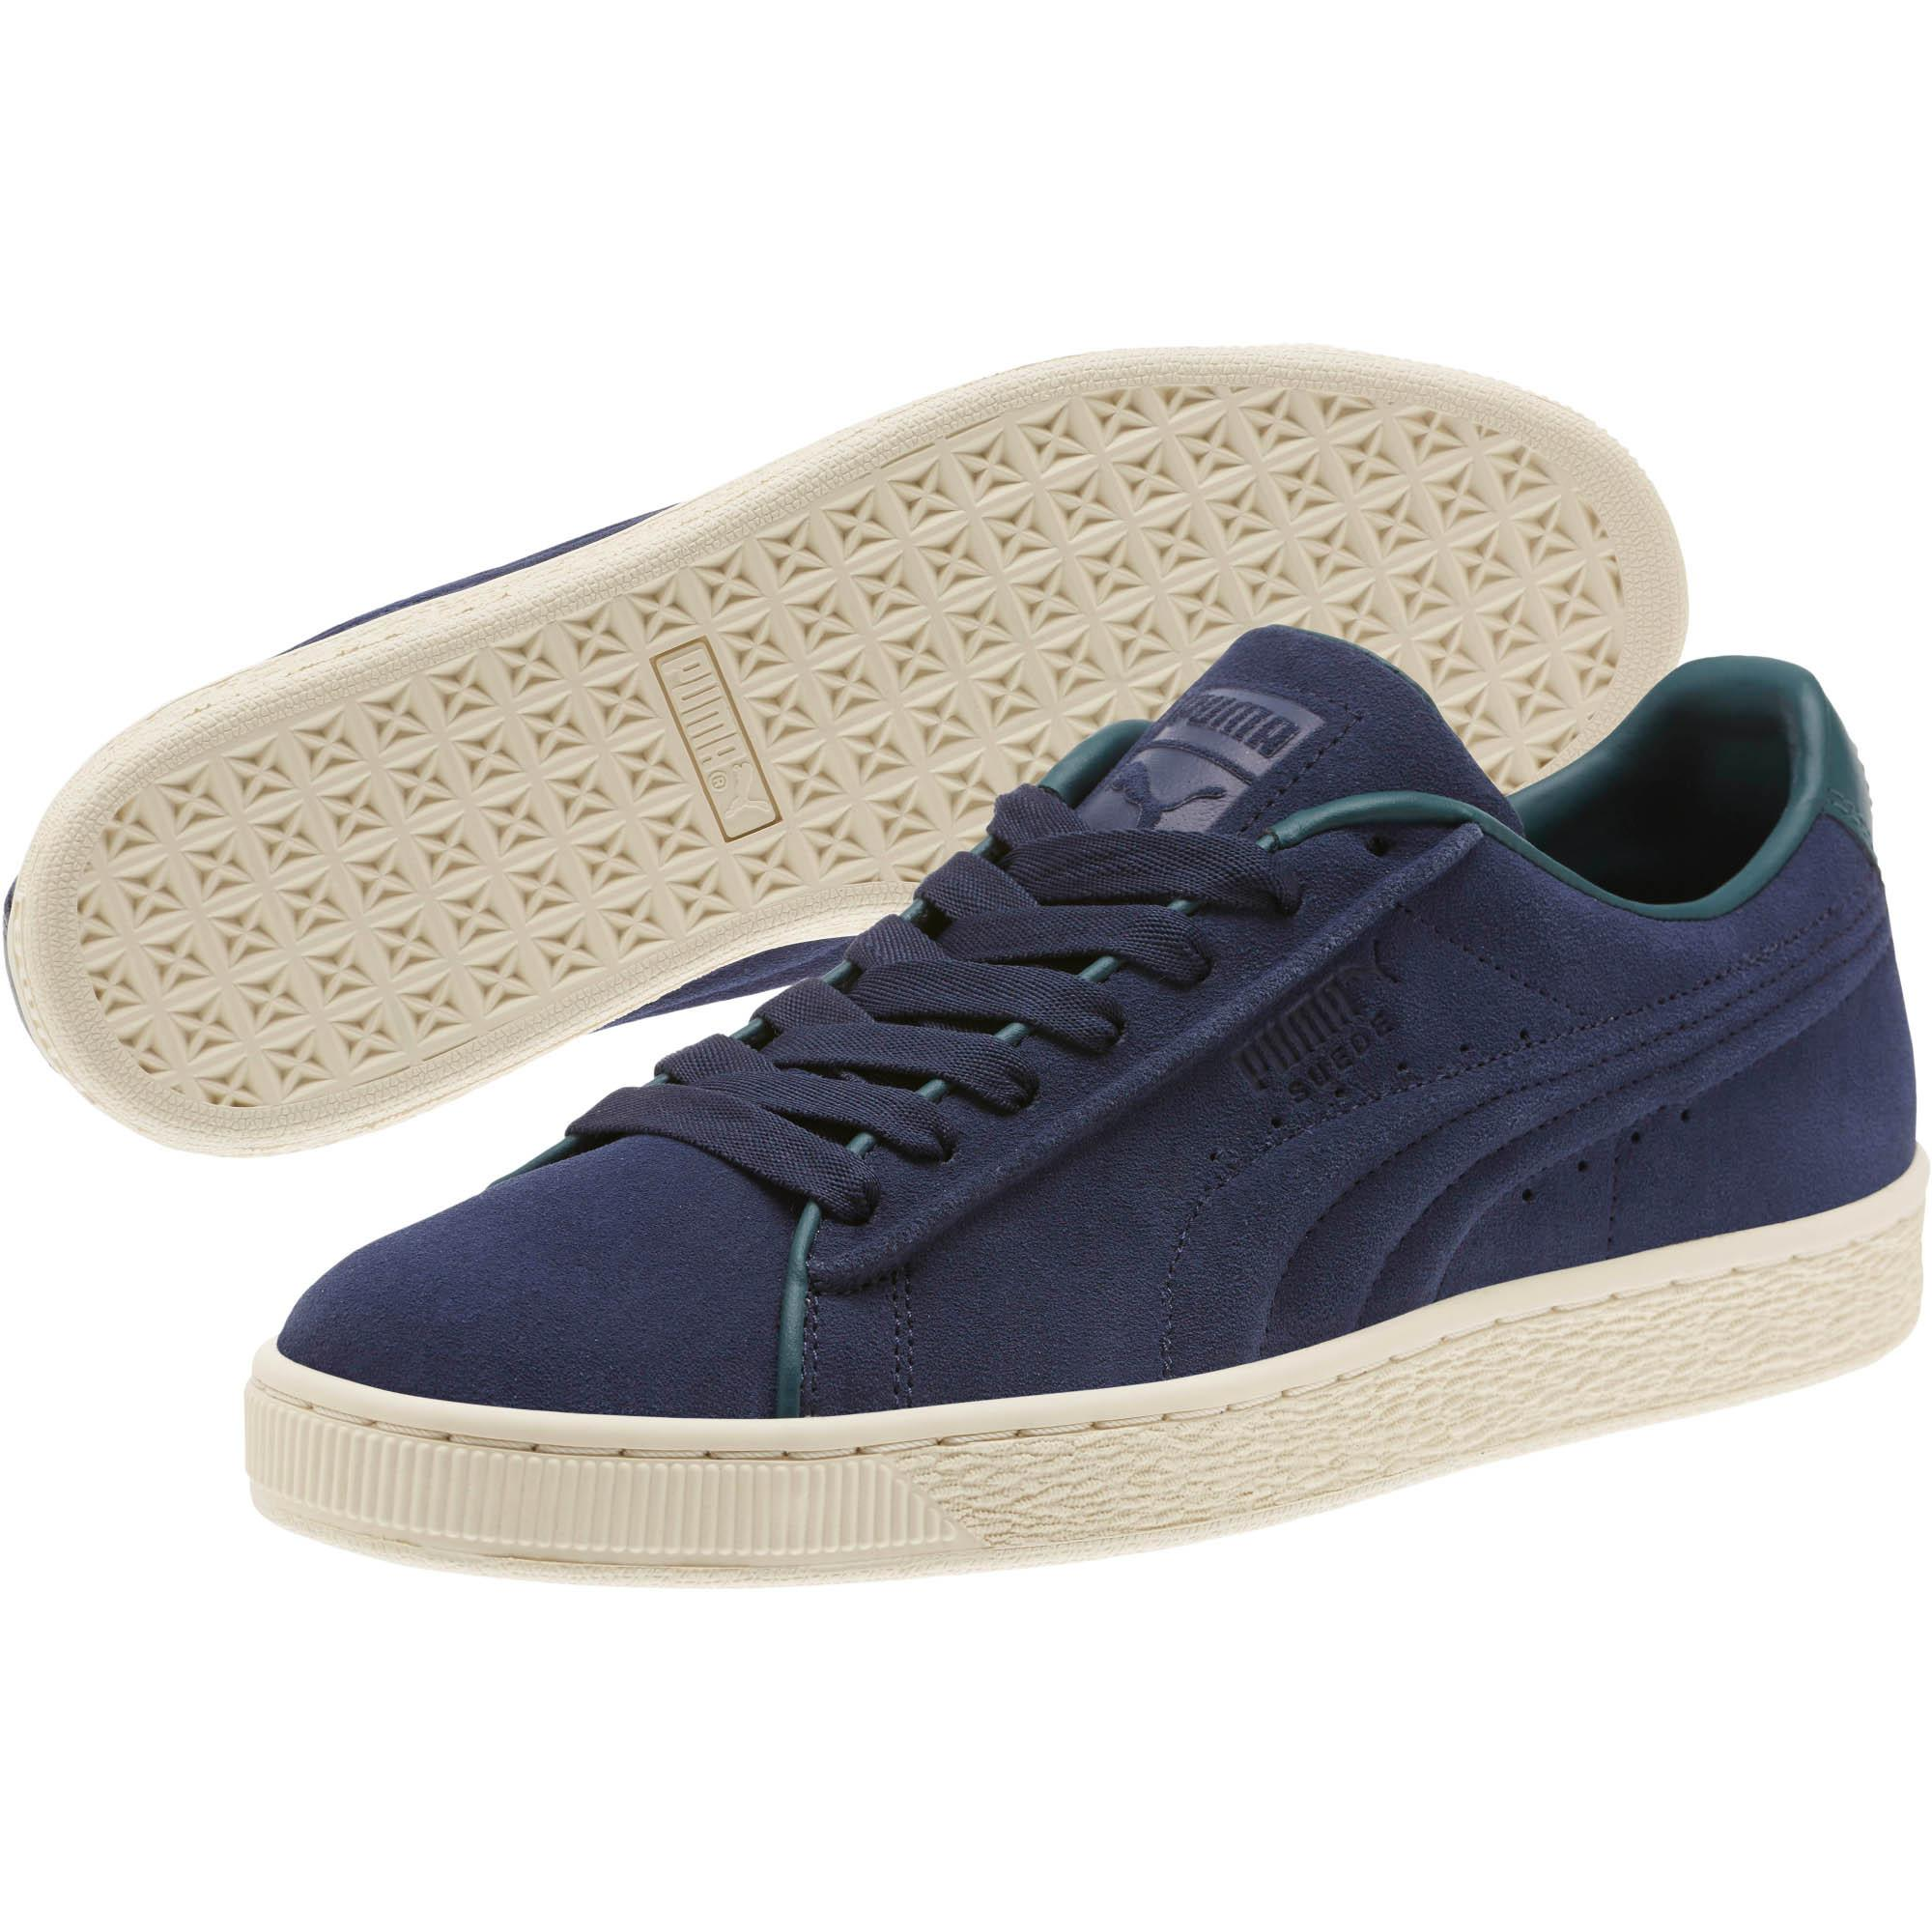 f7ca4b6c18e PUMA - Blue Suede Classic Raised Formstrip Sneakers Unisex Adult - Lyst.  View fullscreen